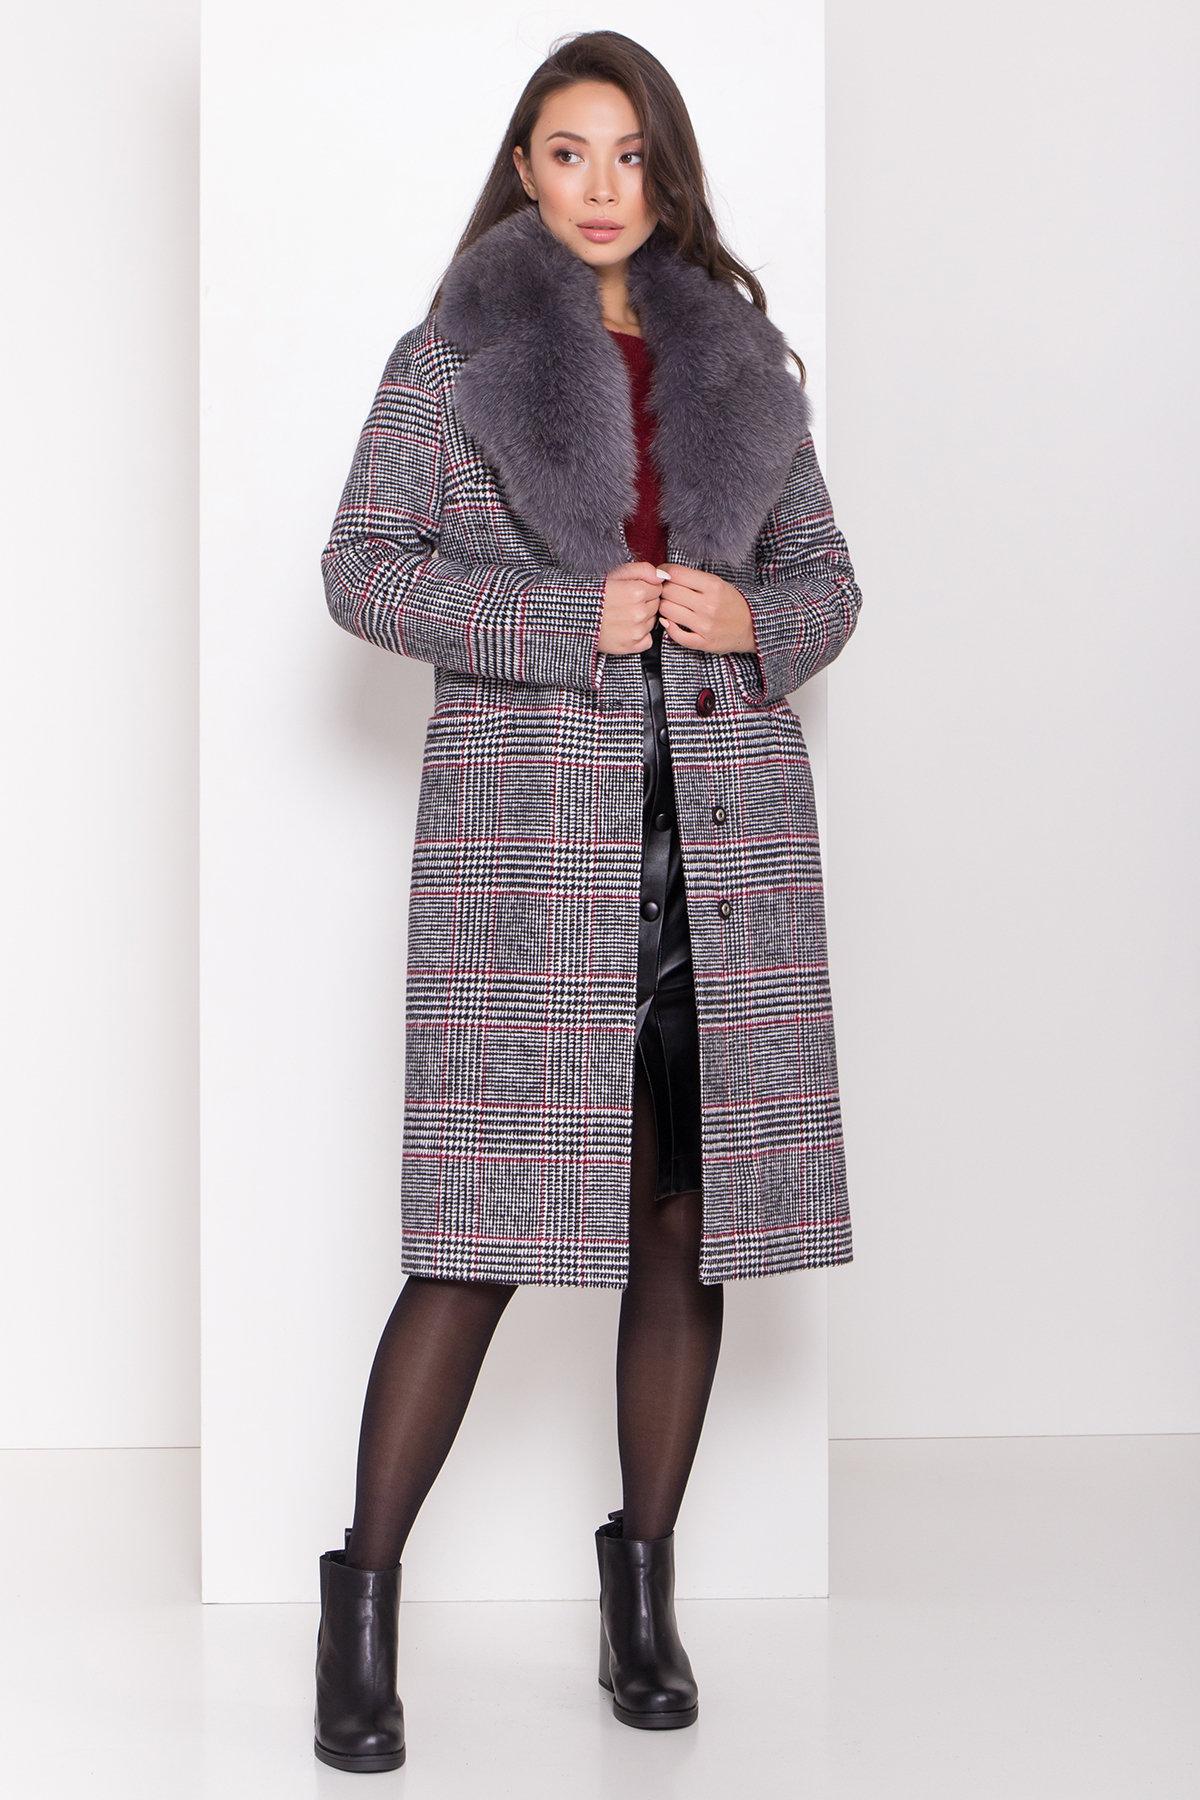 Пальто зима Вива 8279 АРТ. 44392 Цвет: Клетка кр черн/бел/кр - фото 2, интернет магазин tm-modus.ru